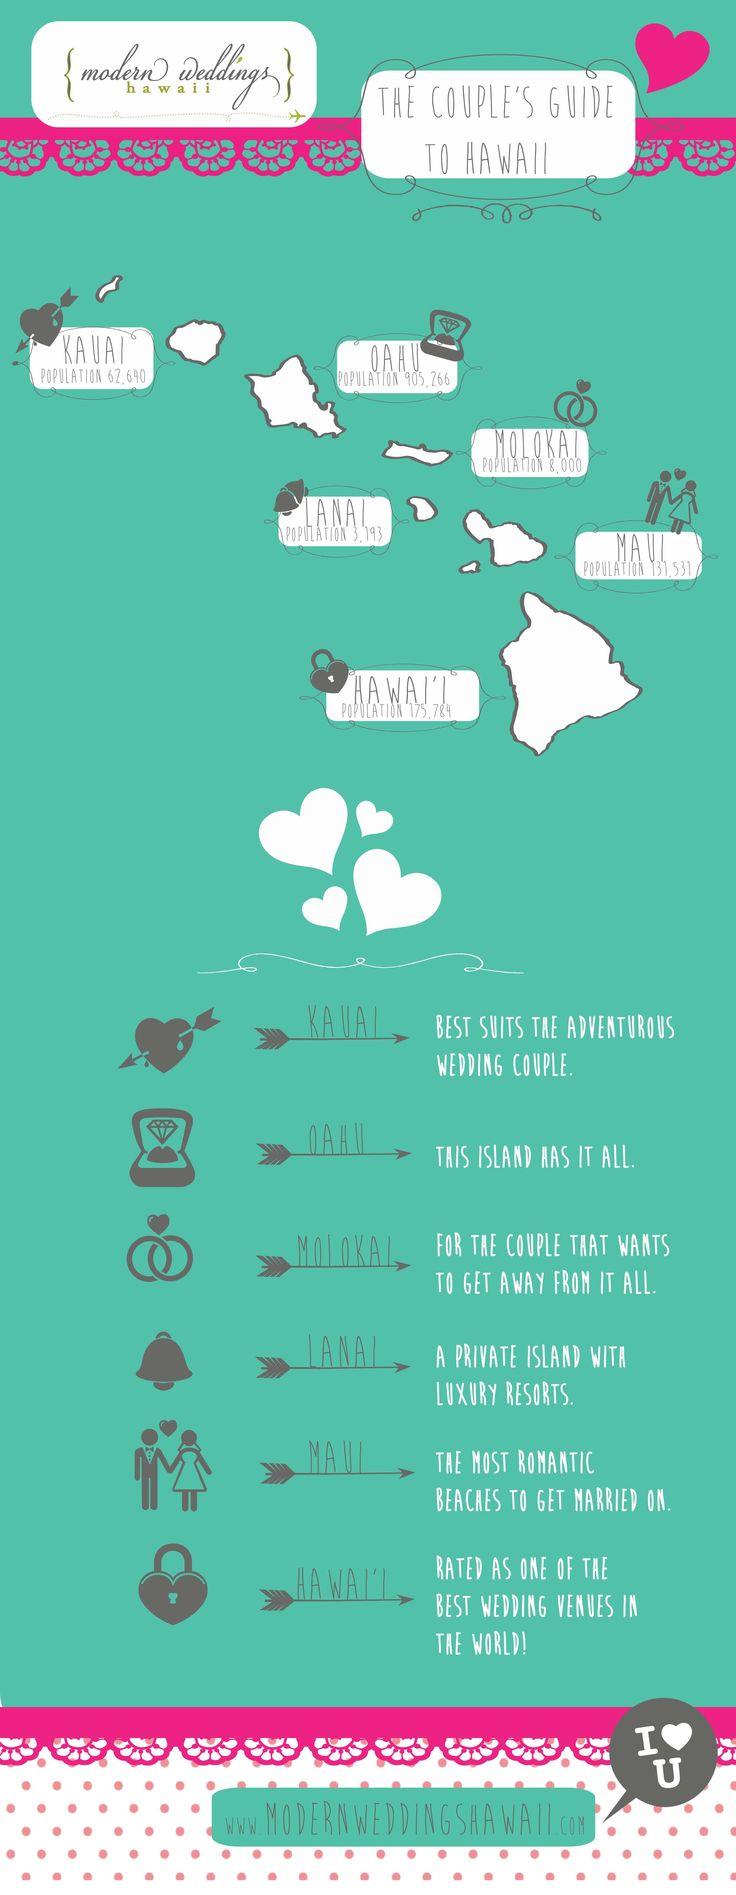 {Modern Weddings Hawaii} PRESENTS The Couple's Guide to Hawaii.